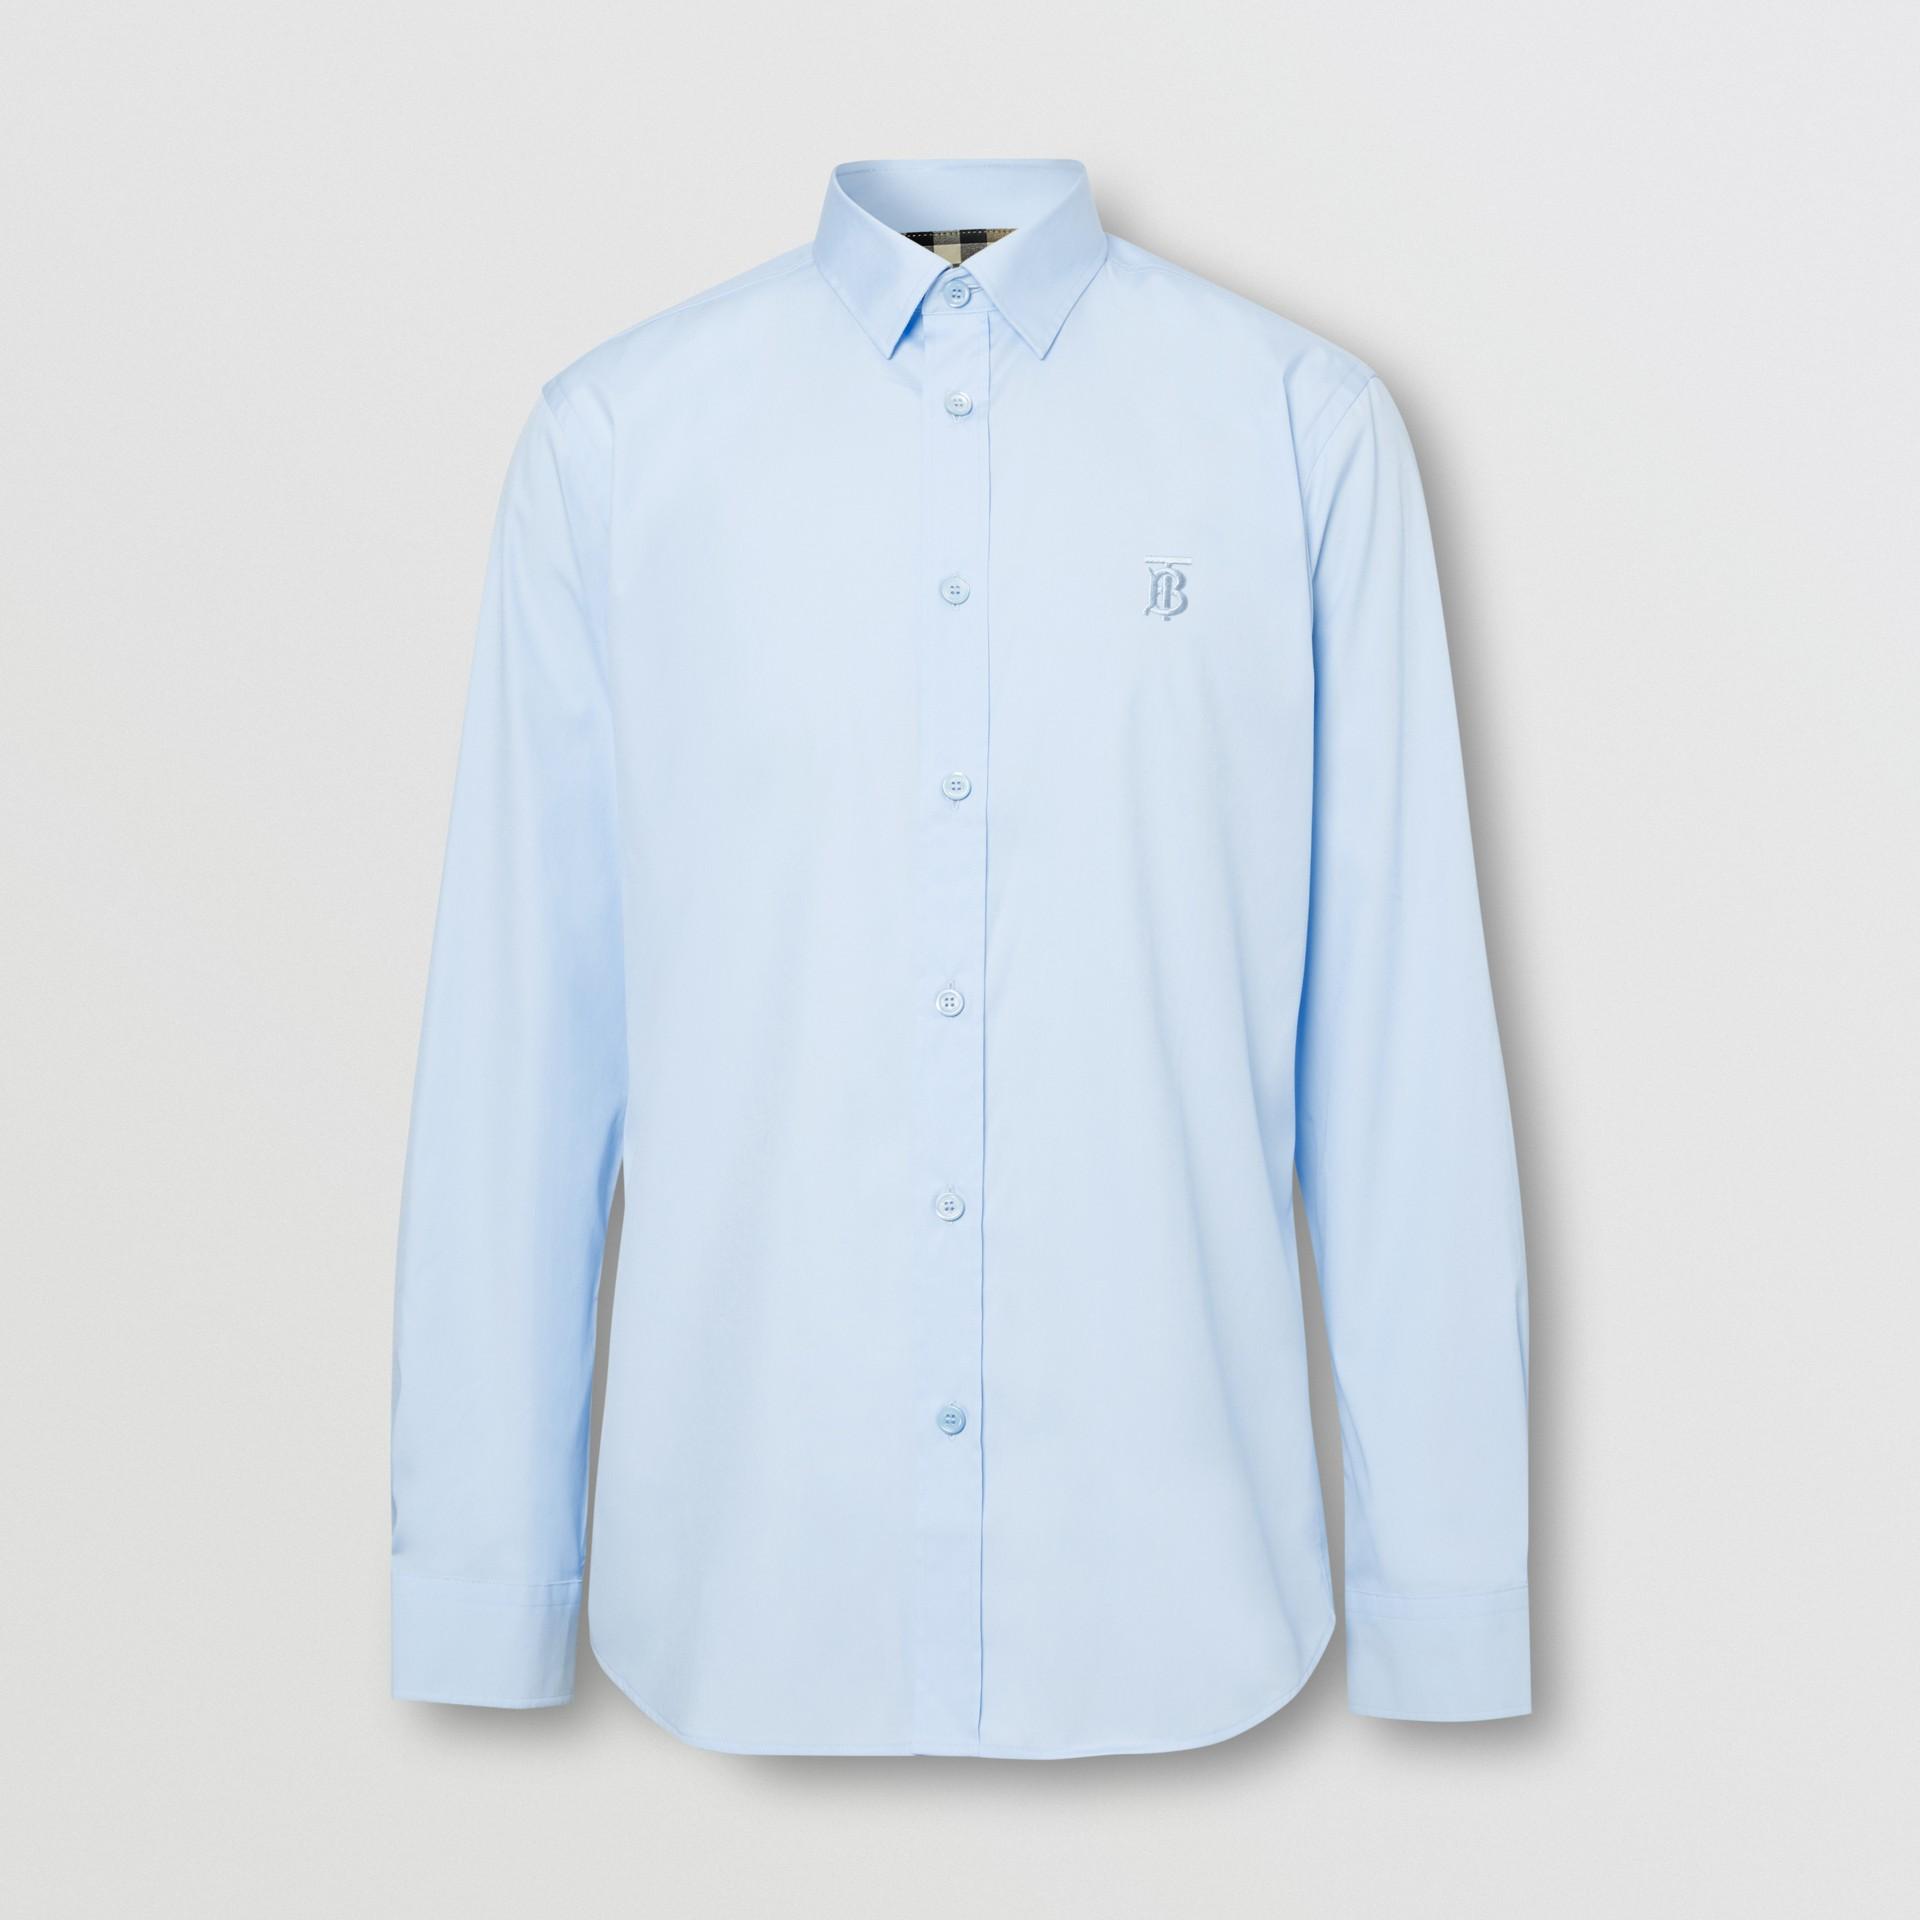 Monogram Motif Cotton Oxford Shirt in White - Men | Burberry - gallery image 3